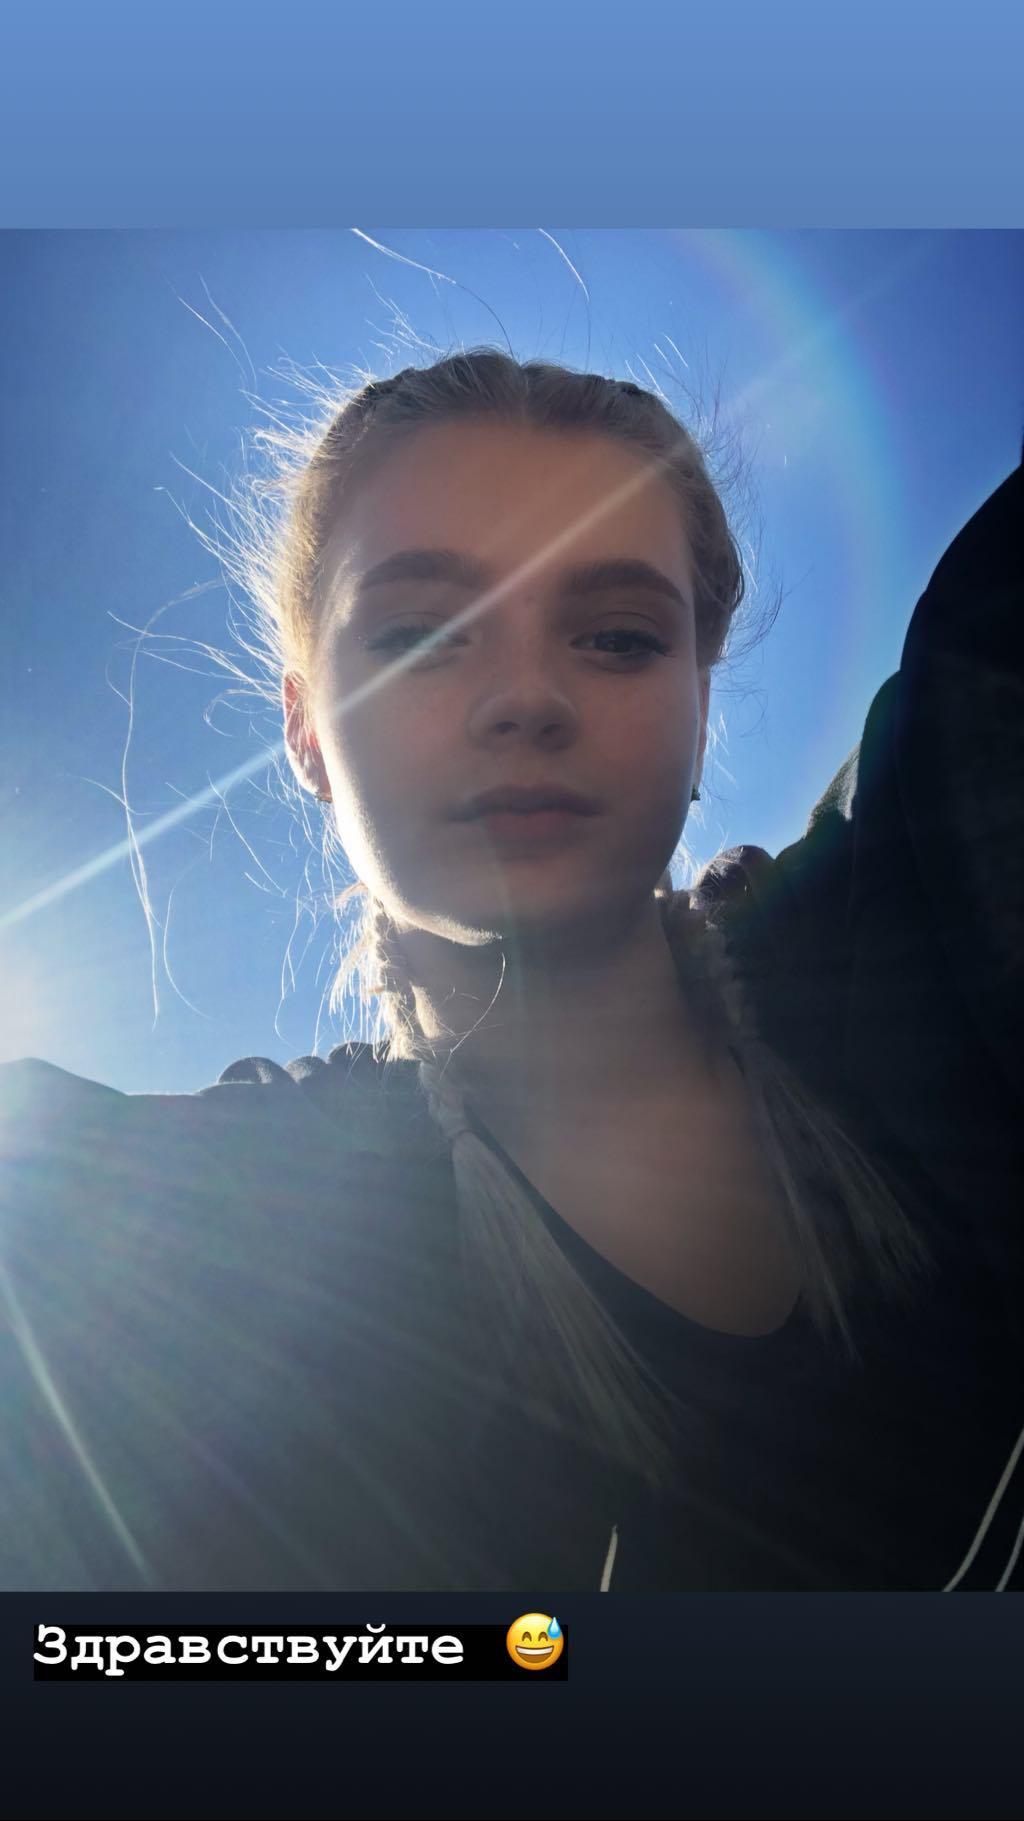 Анастасия Скопцова-Кирилл Алешин/танцы на льду - Страница 10 Civw0PvyATk